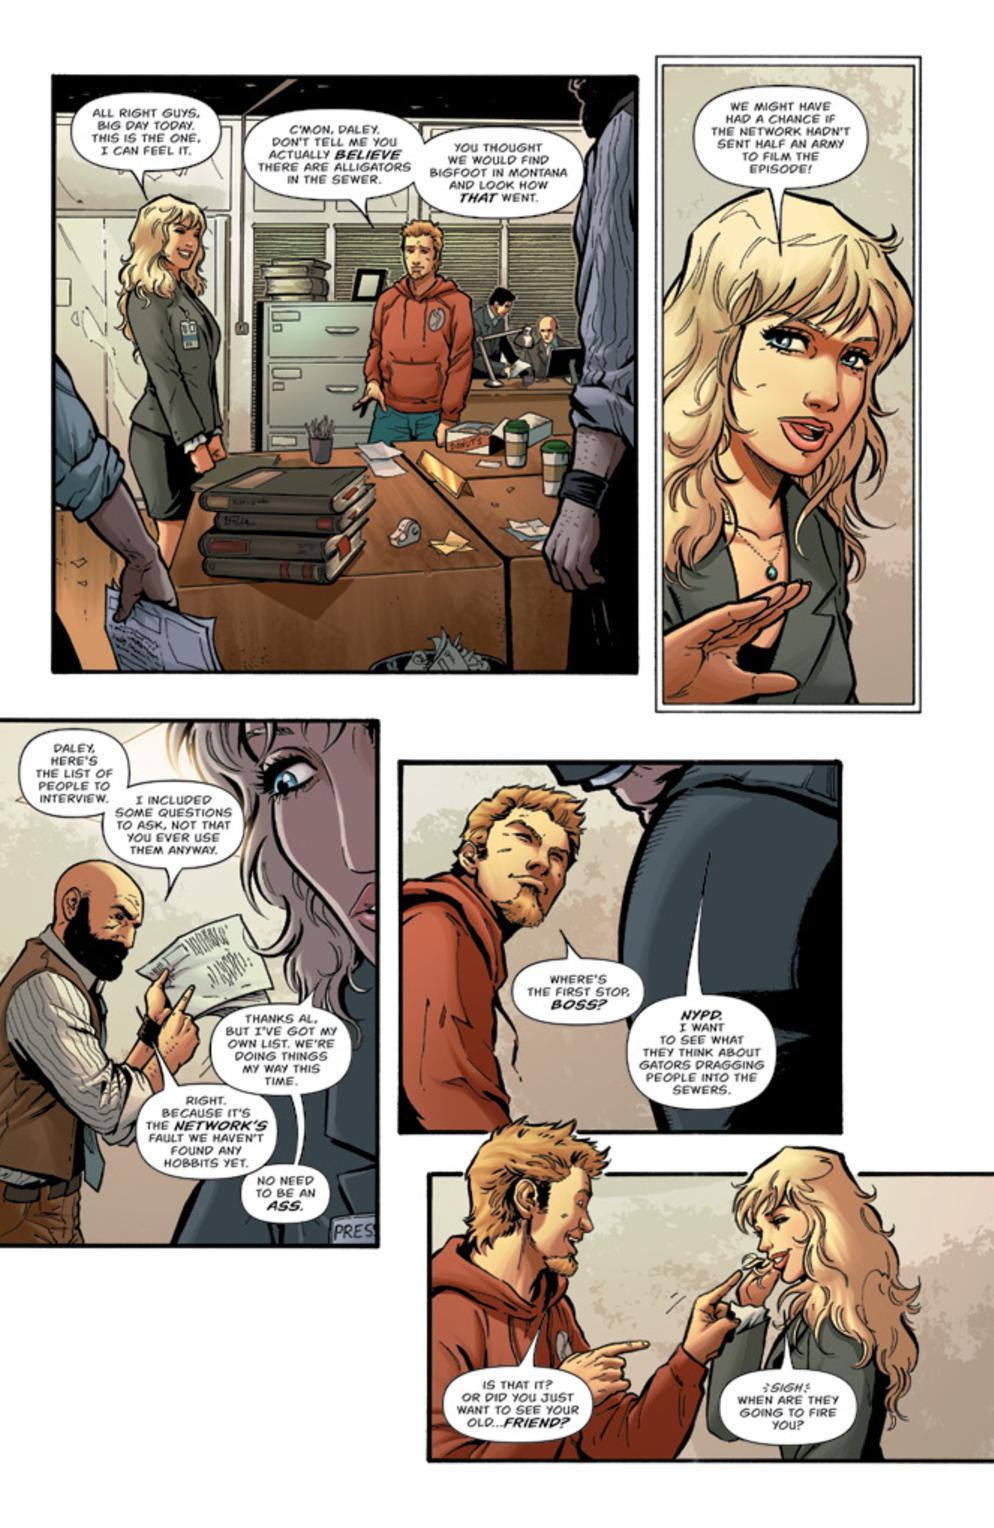 GTOT_06_Vol3-page-006